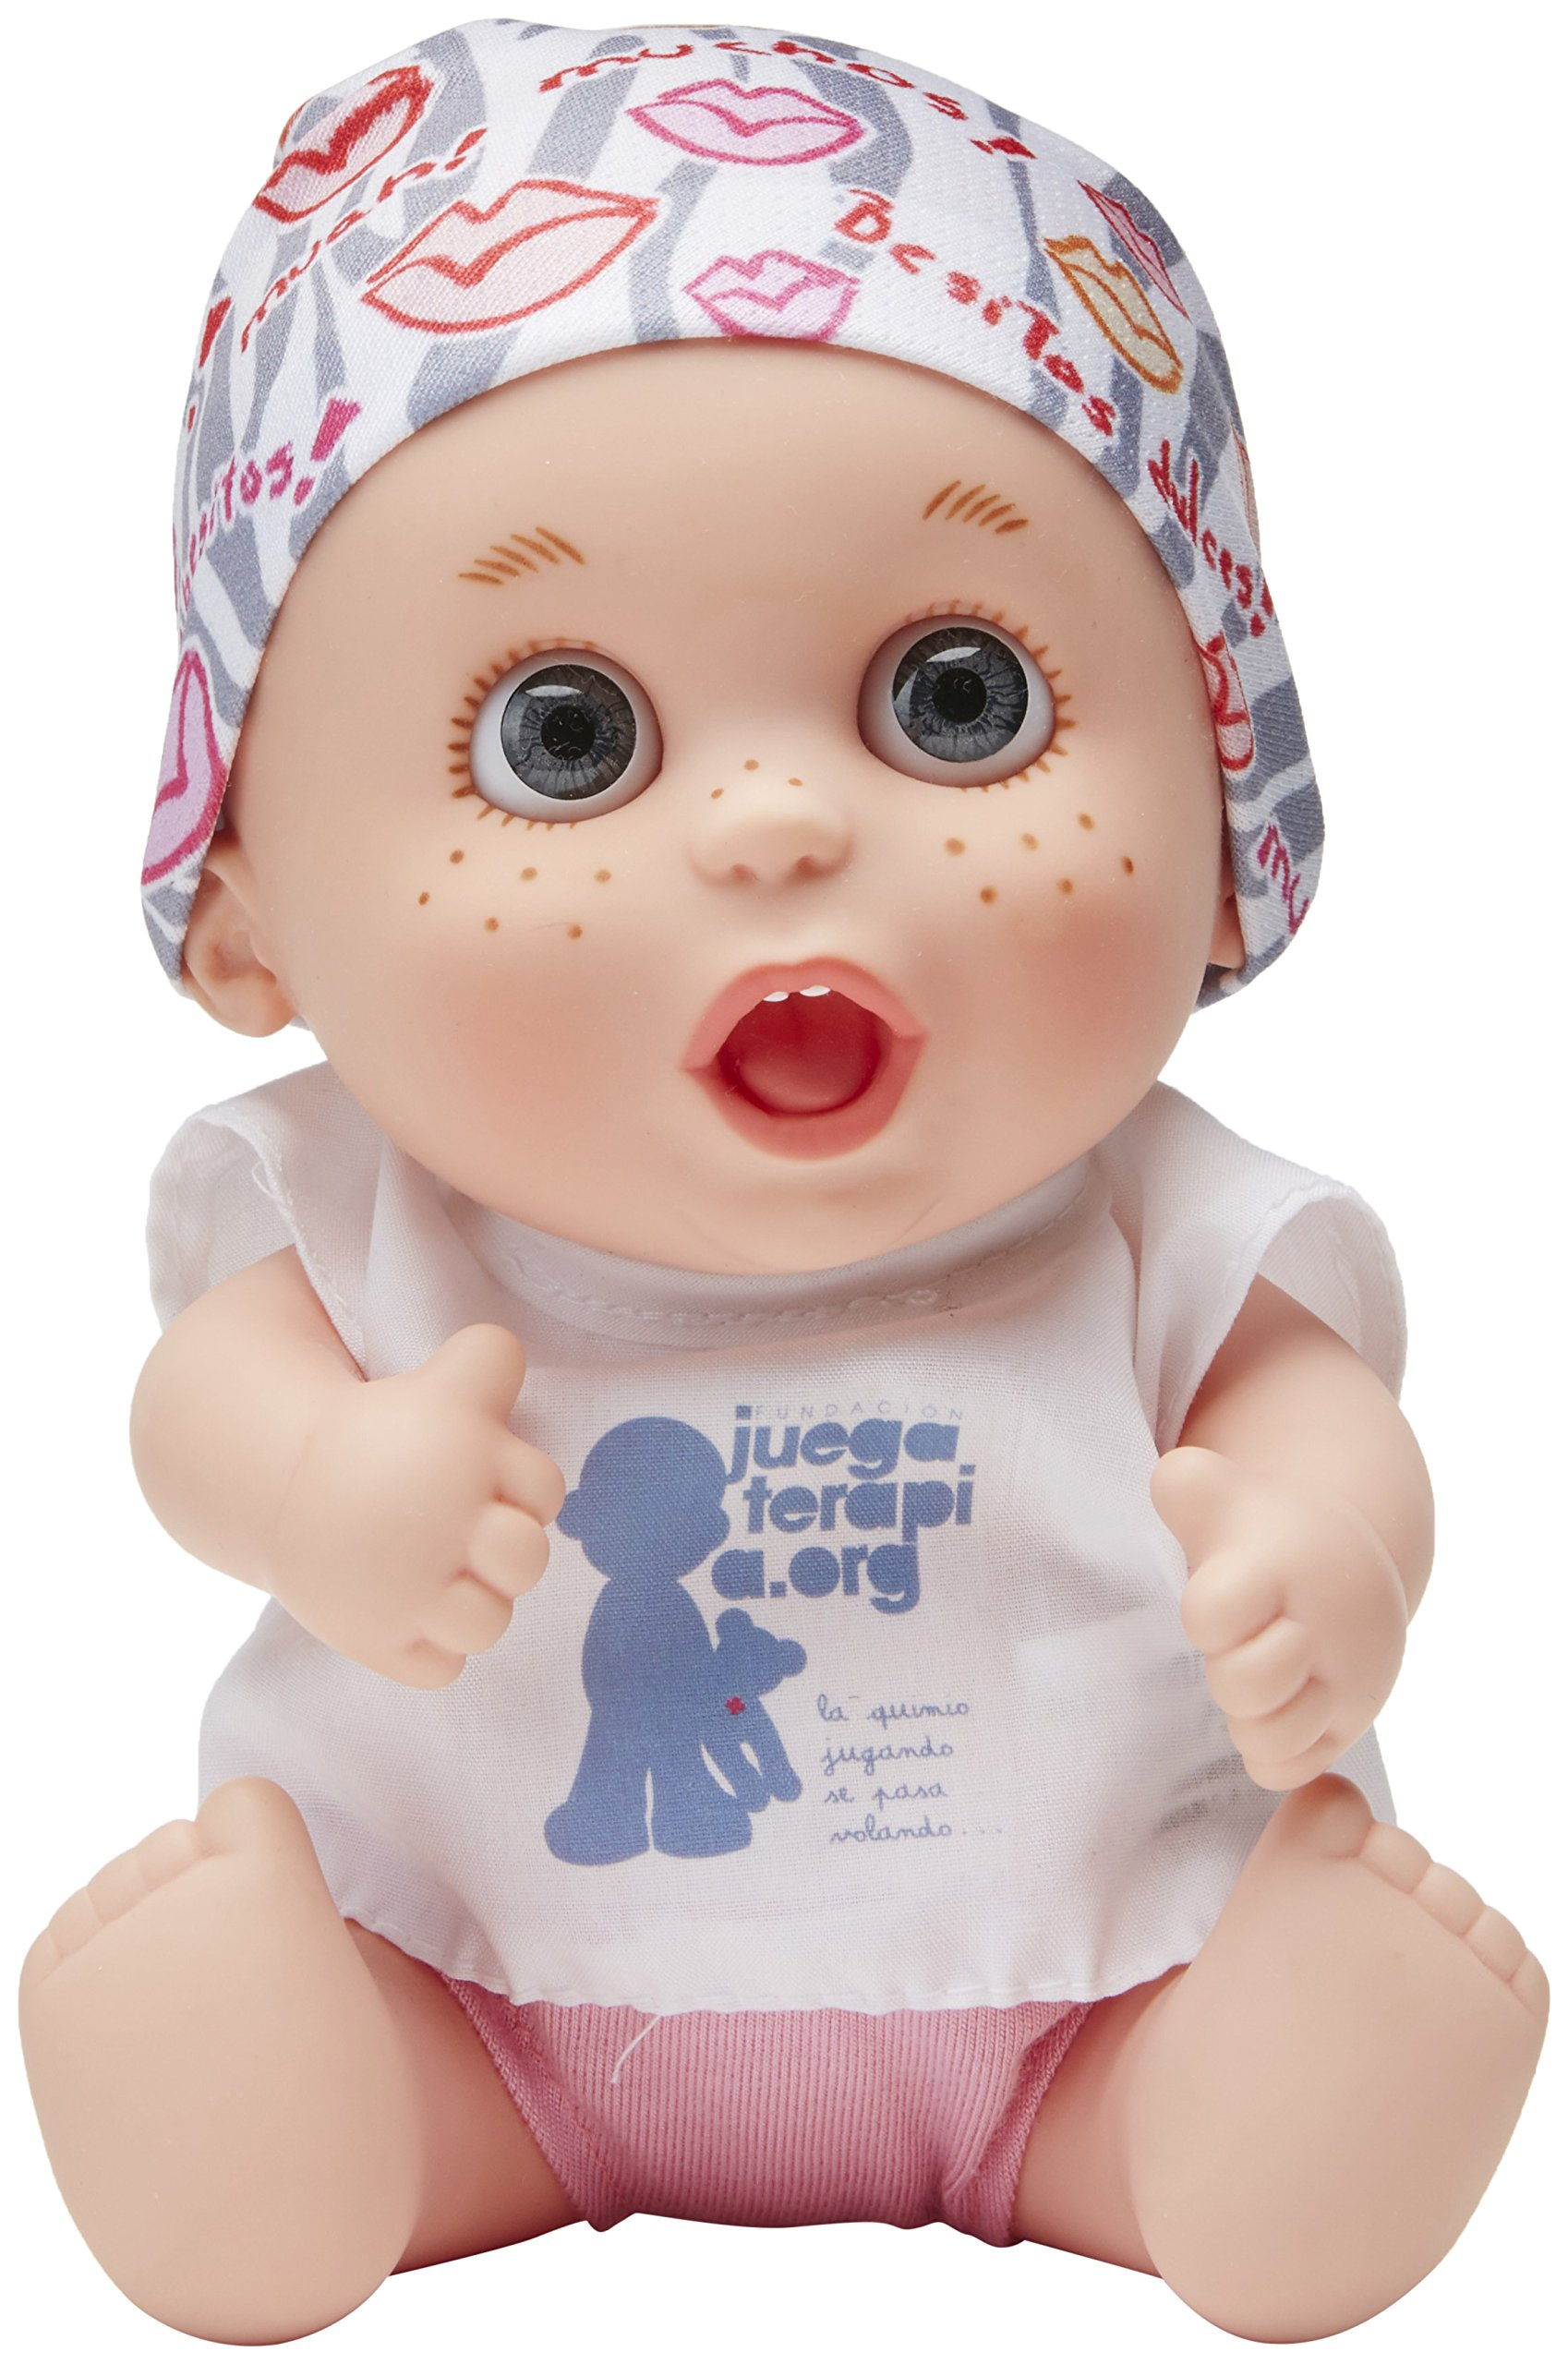 Juegaterapia 0150, Muñeco Baby Pelón Shakira